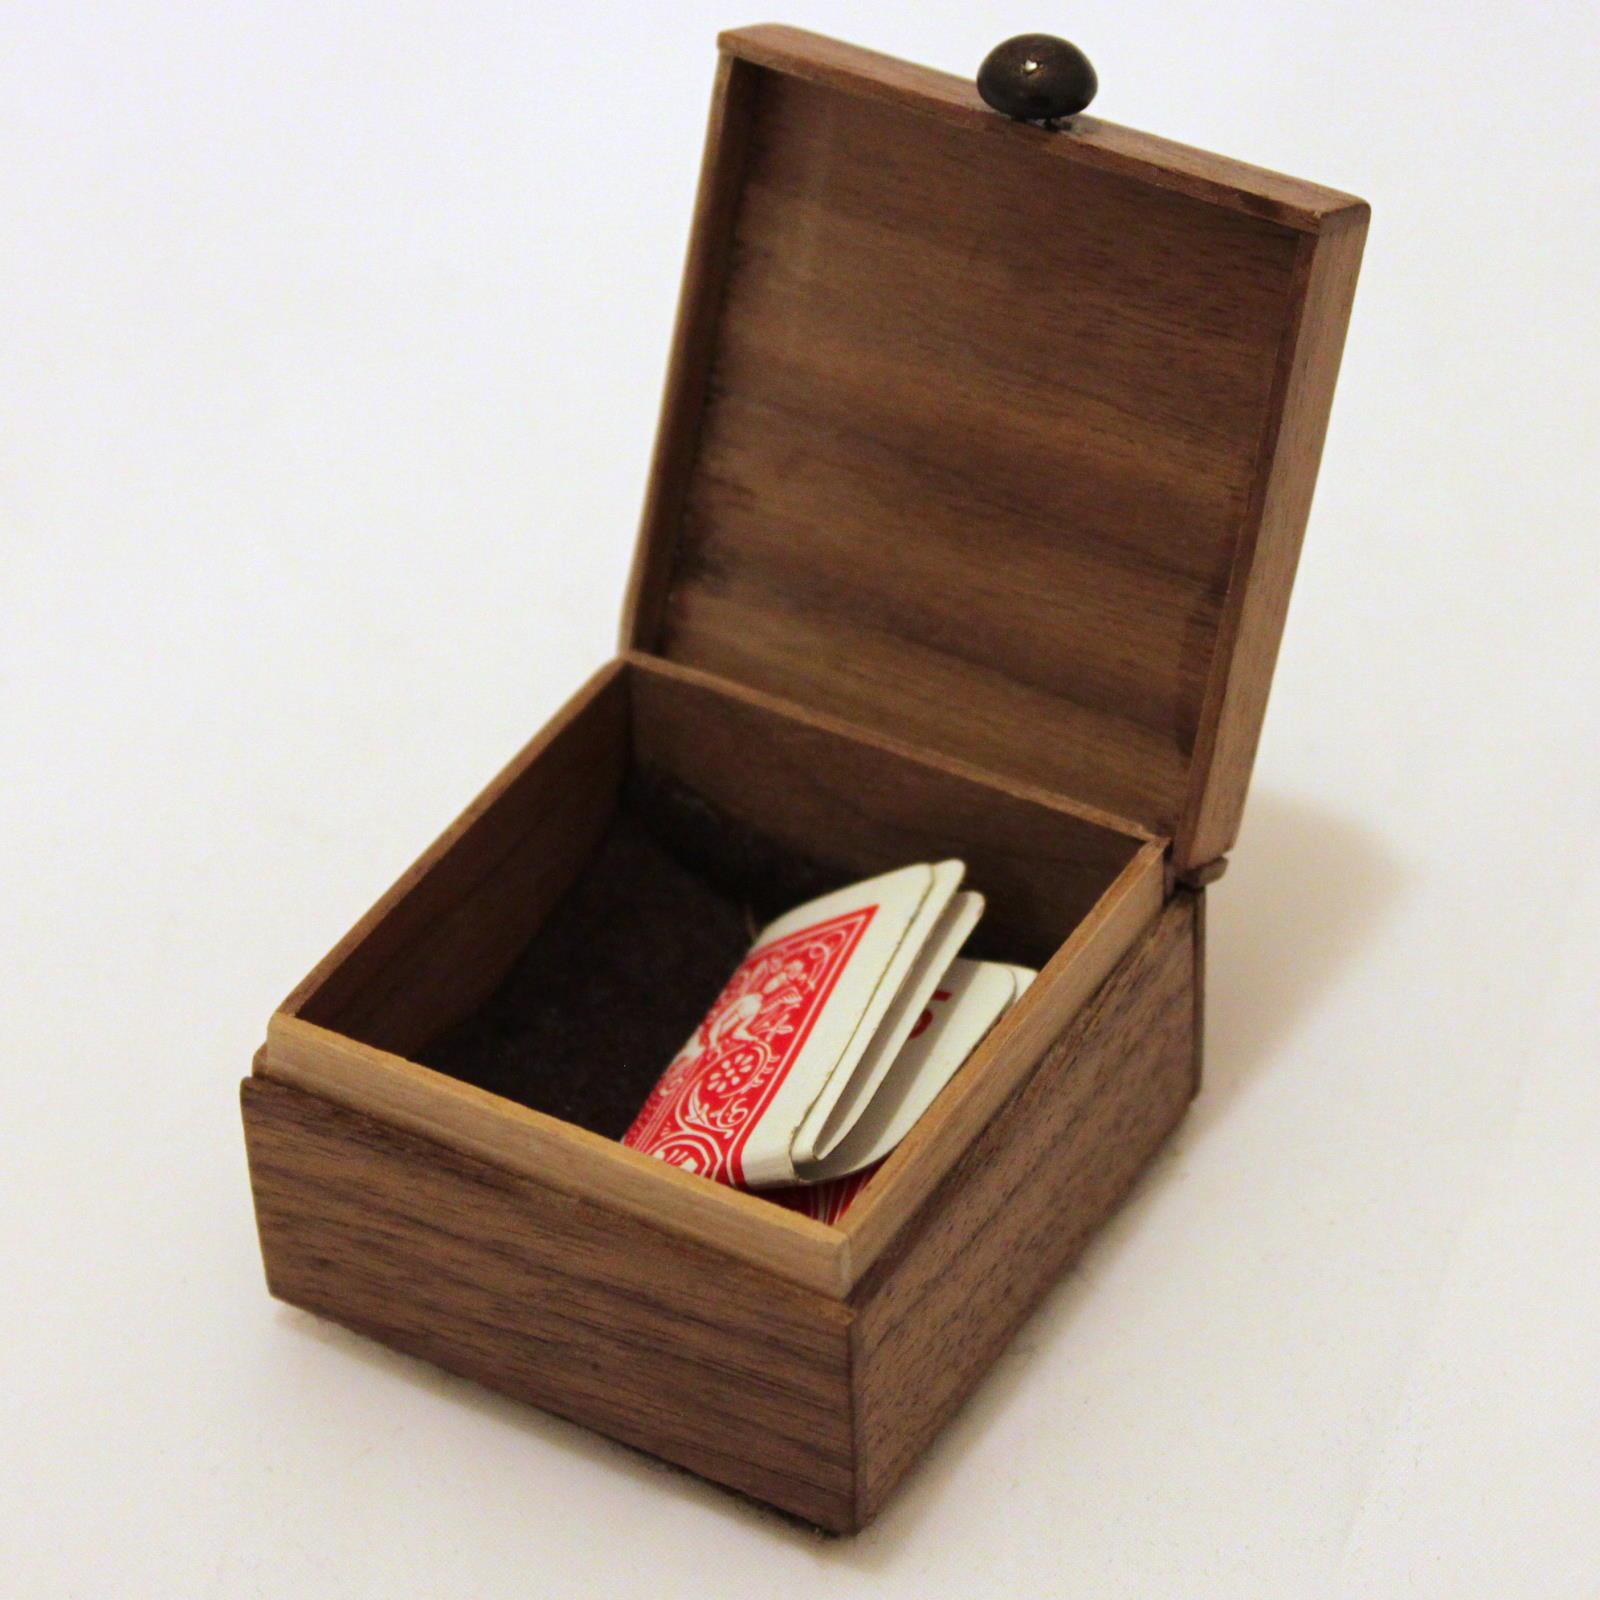 Tommy Wonder Ring Box by Tabman